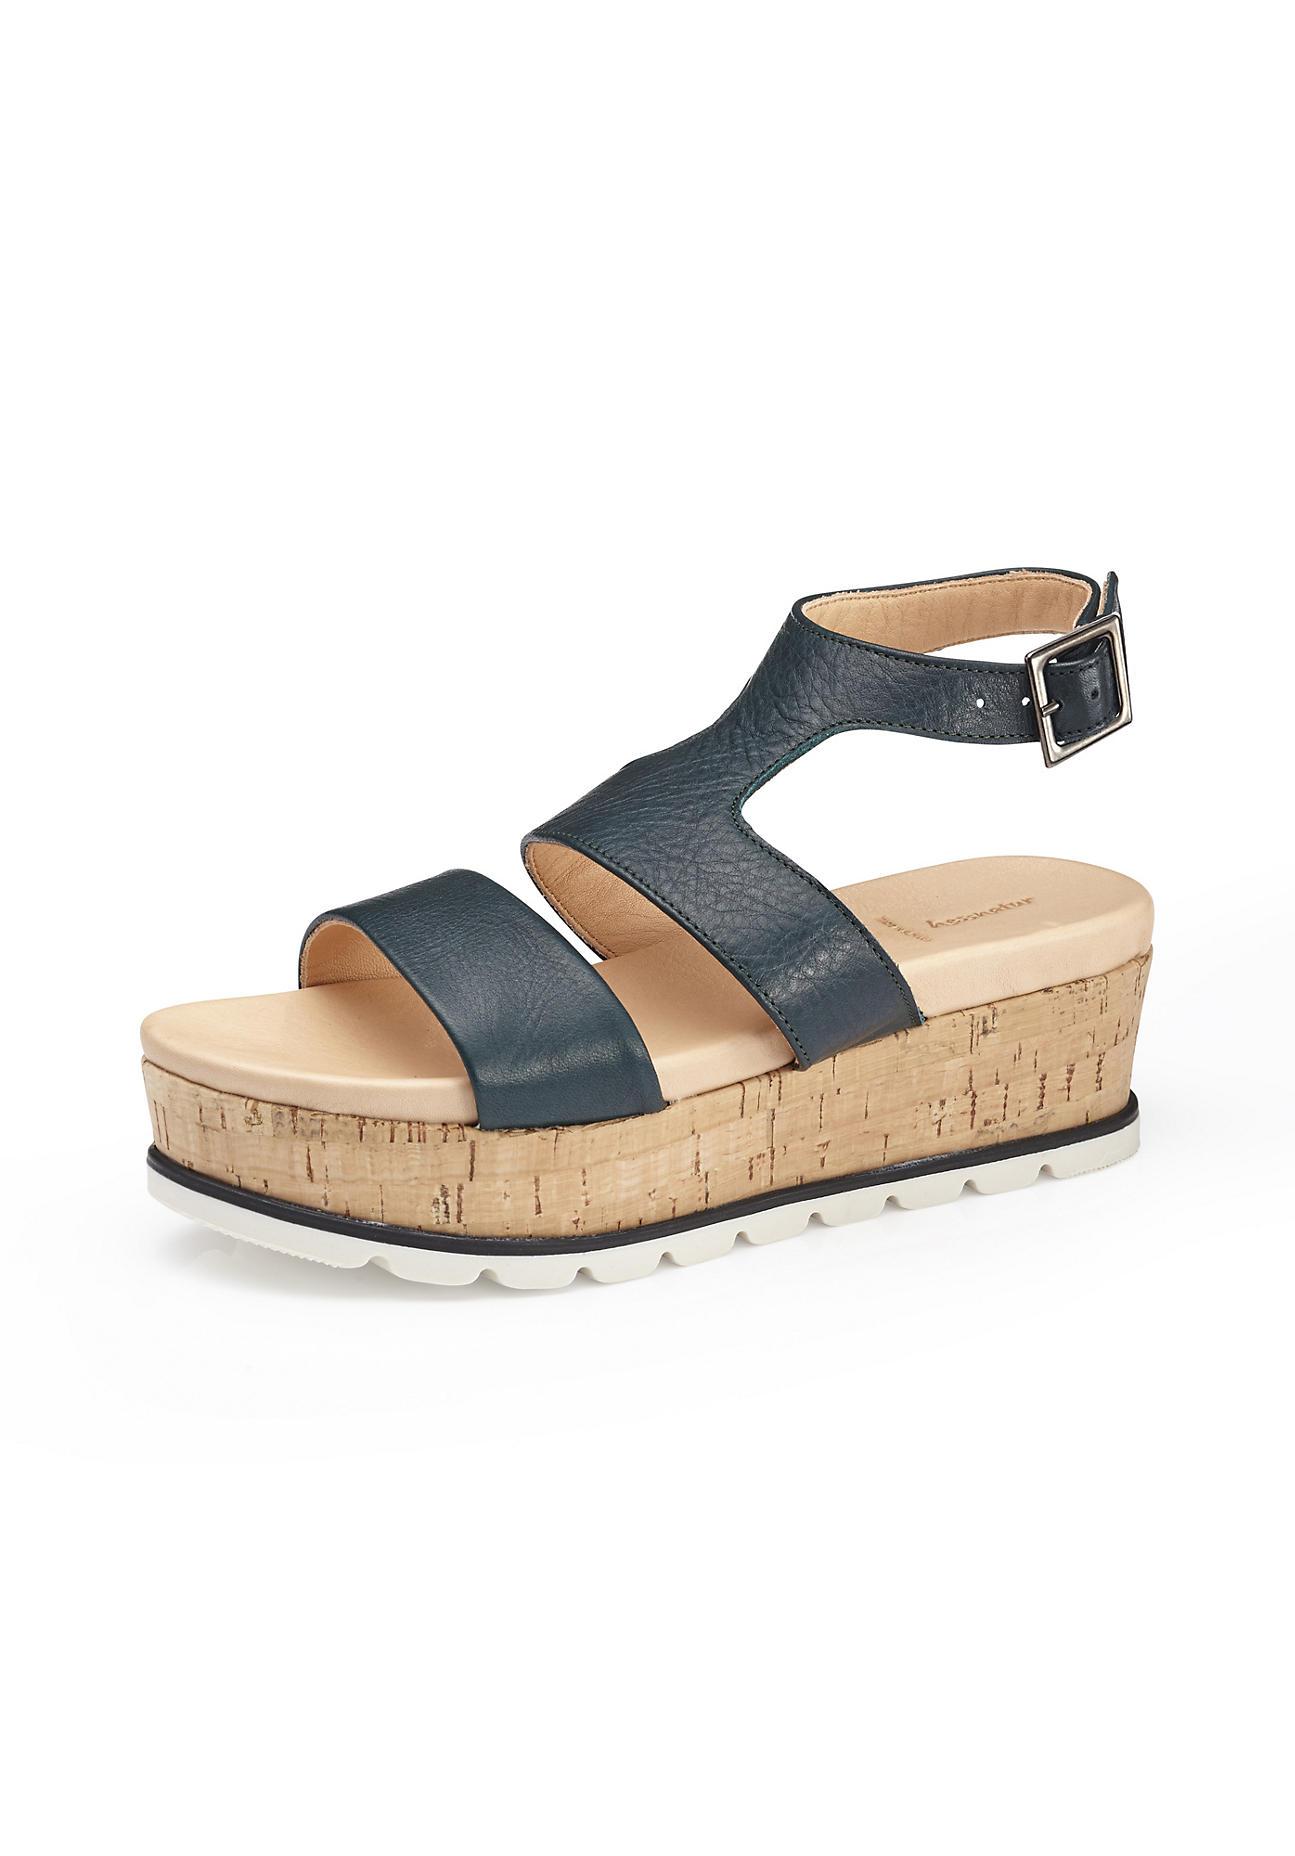 hessnatur Damen Damen Sandalette aus Leder – grün – Größe 36